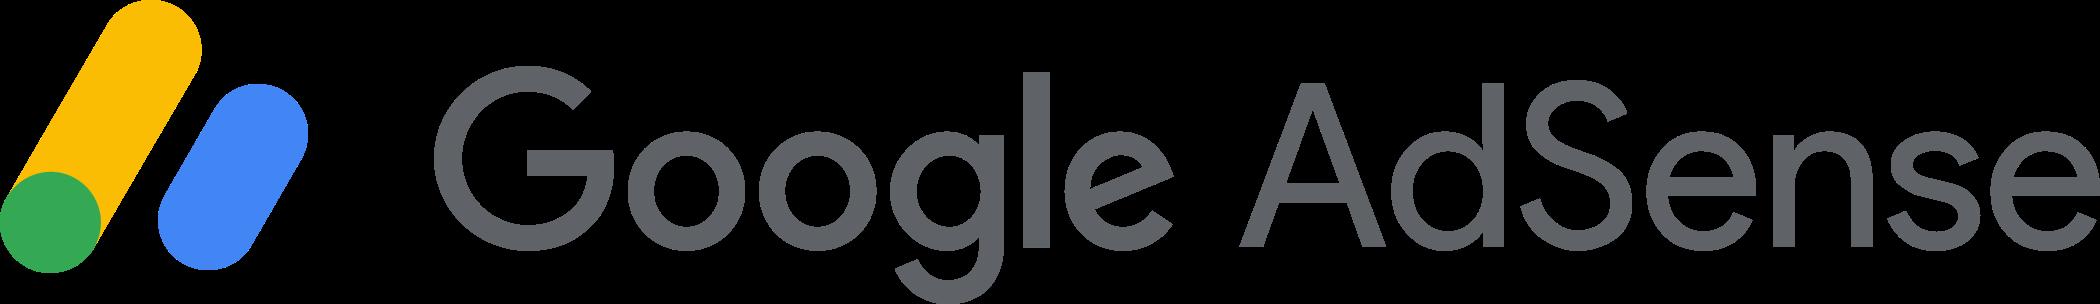 google adsense logo 1 1 - Google Adsense Logo